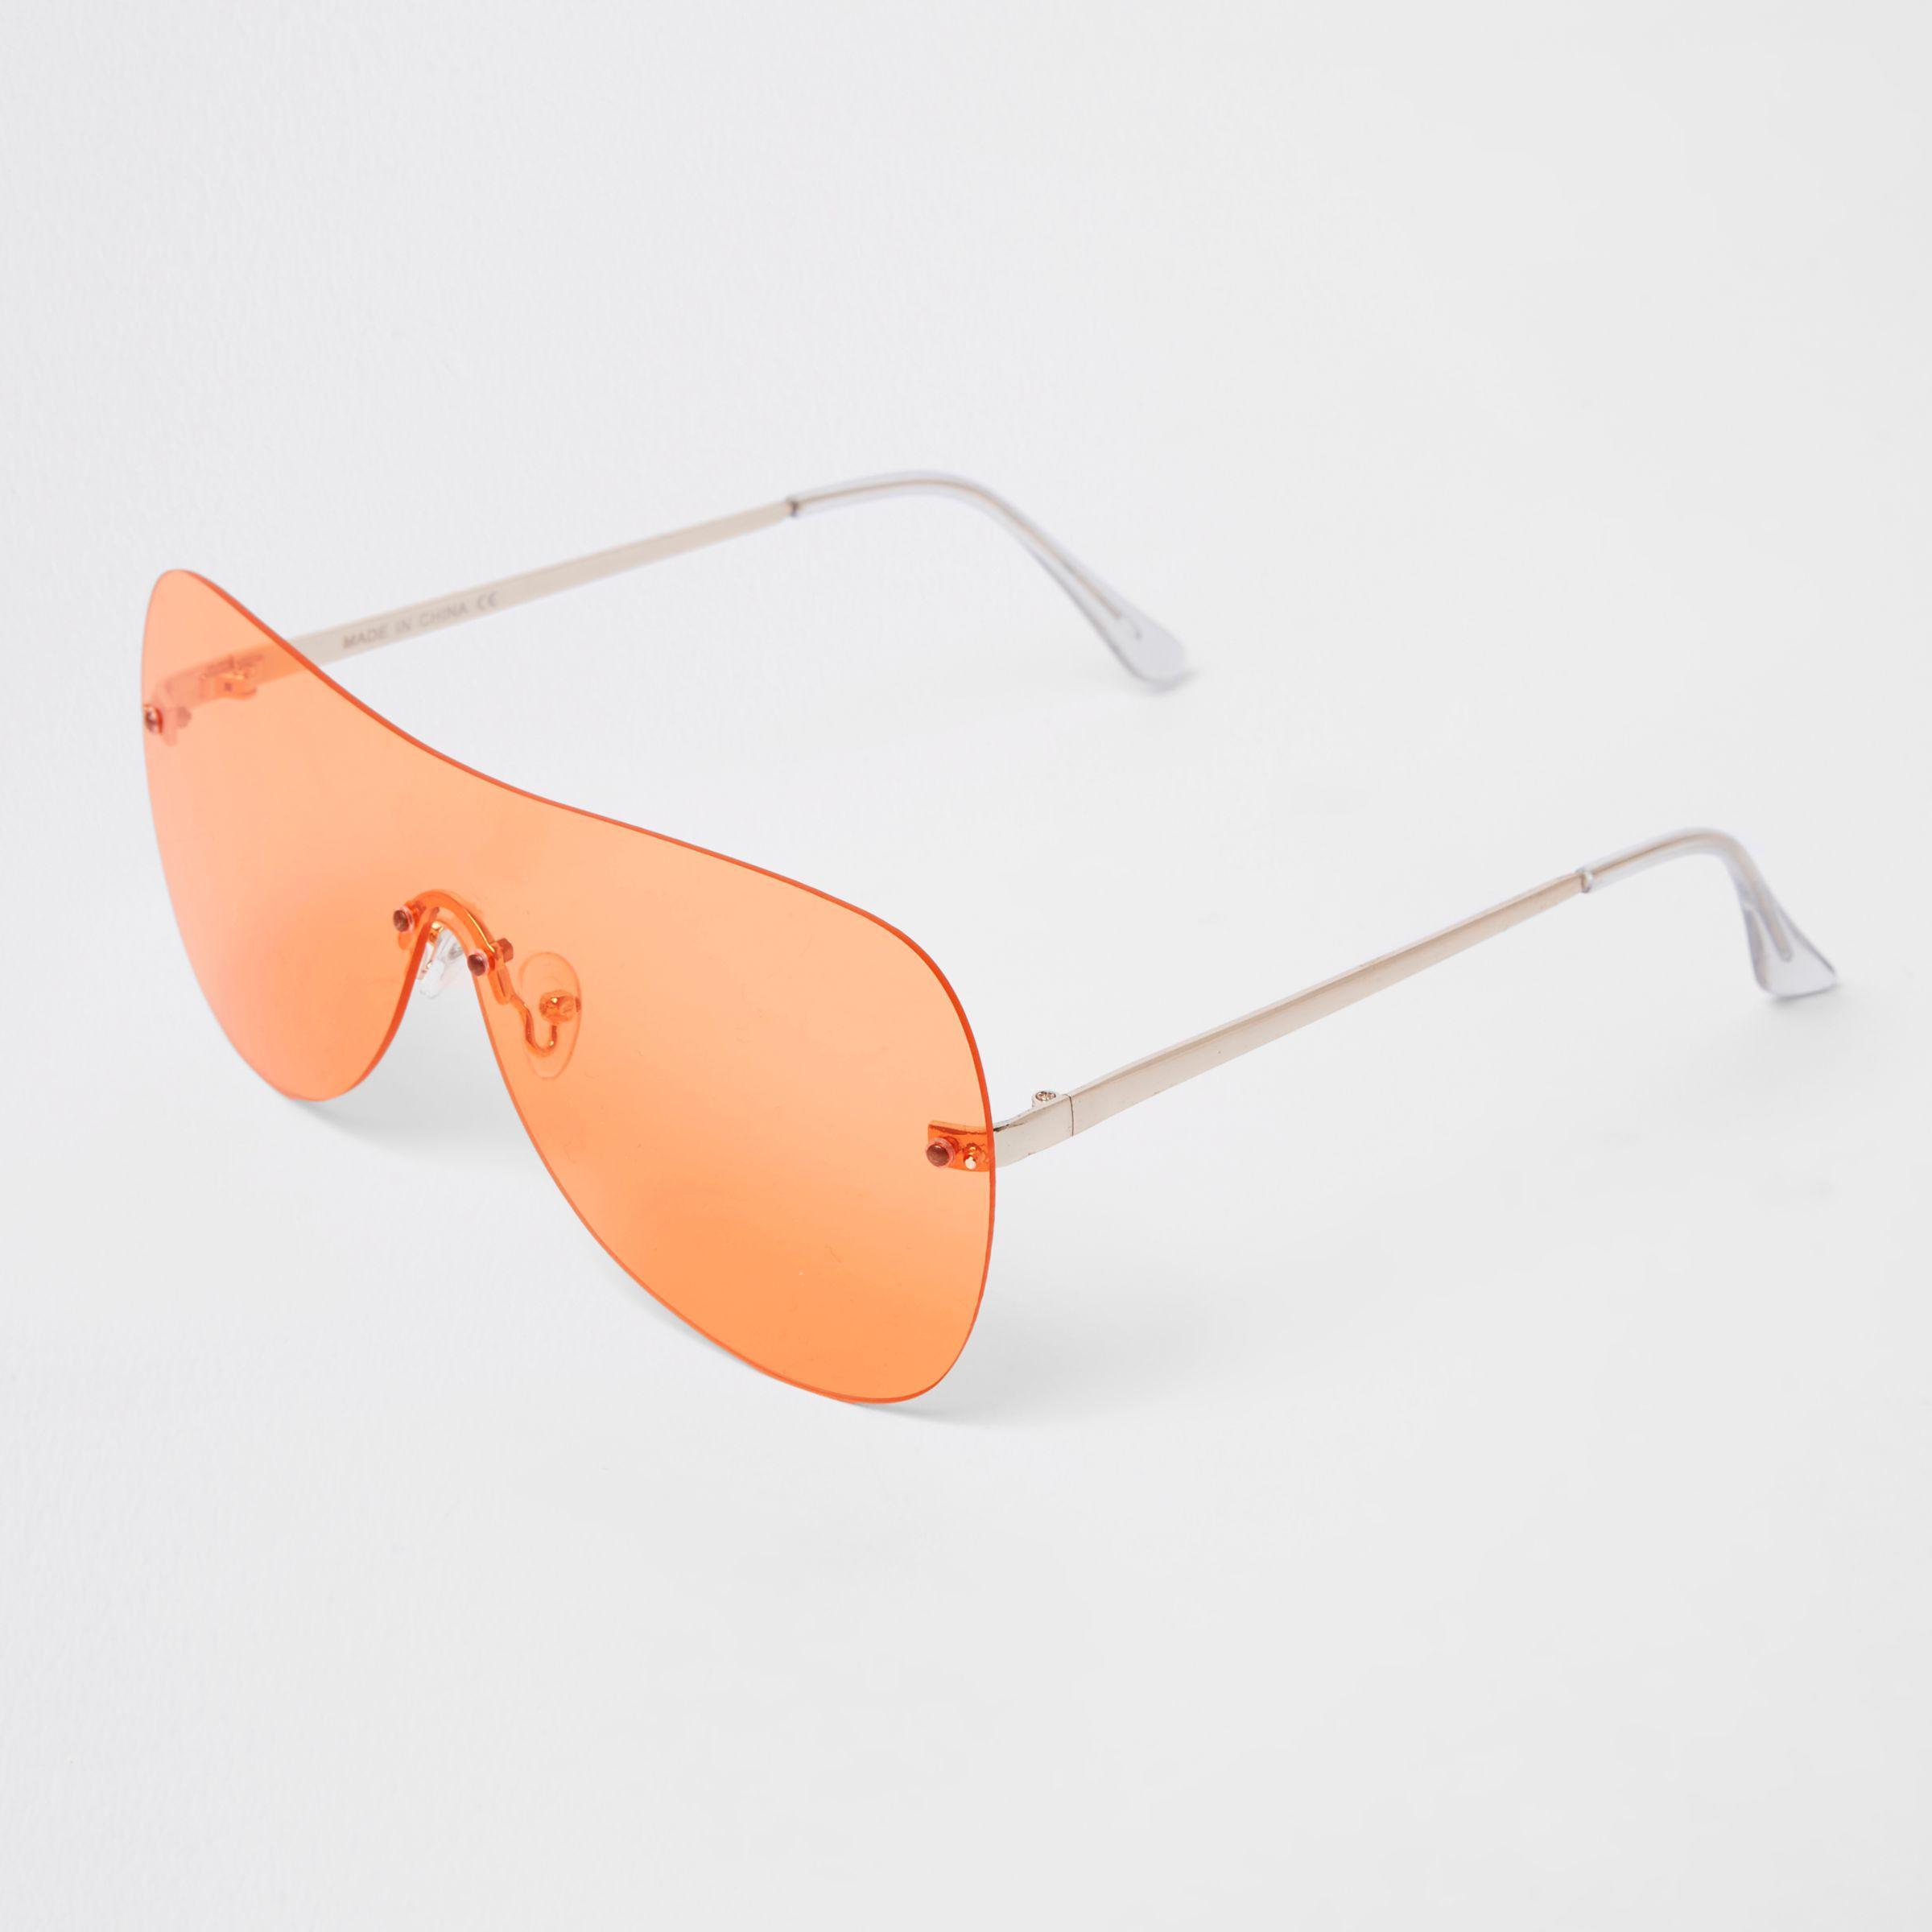 8f4ffb739d0b Lyst - River Island Orange Tone Visor Aviator Sunglasses in Orange ...